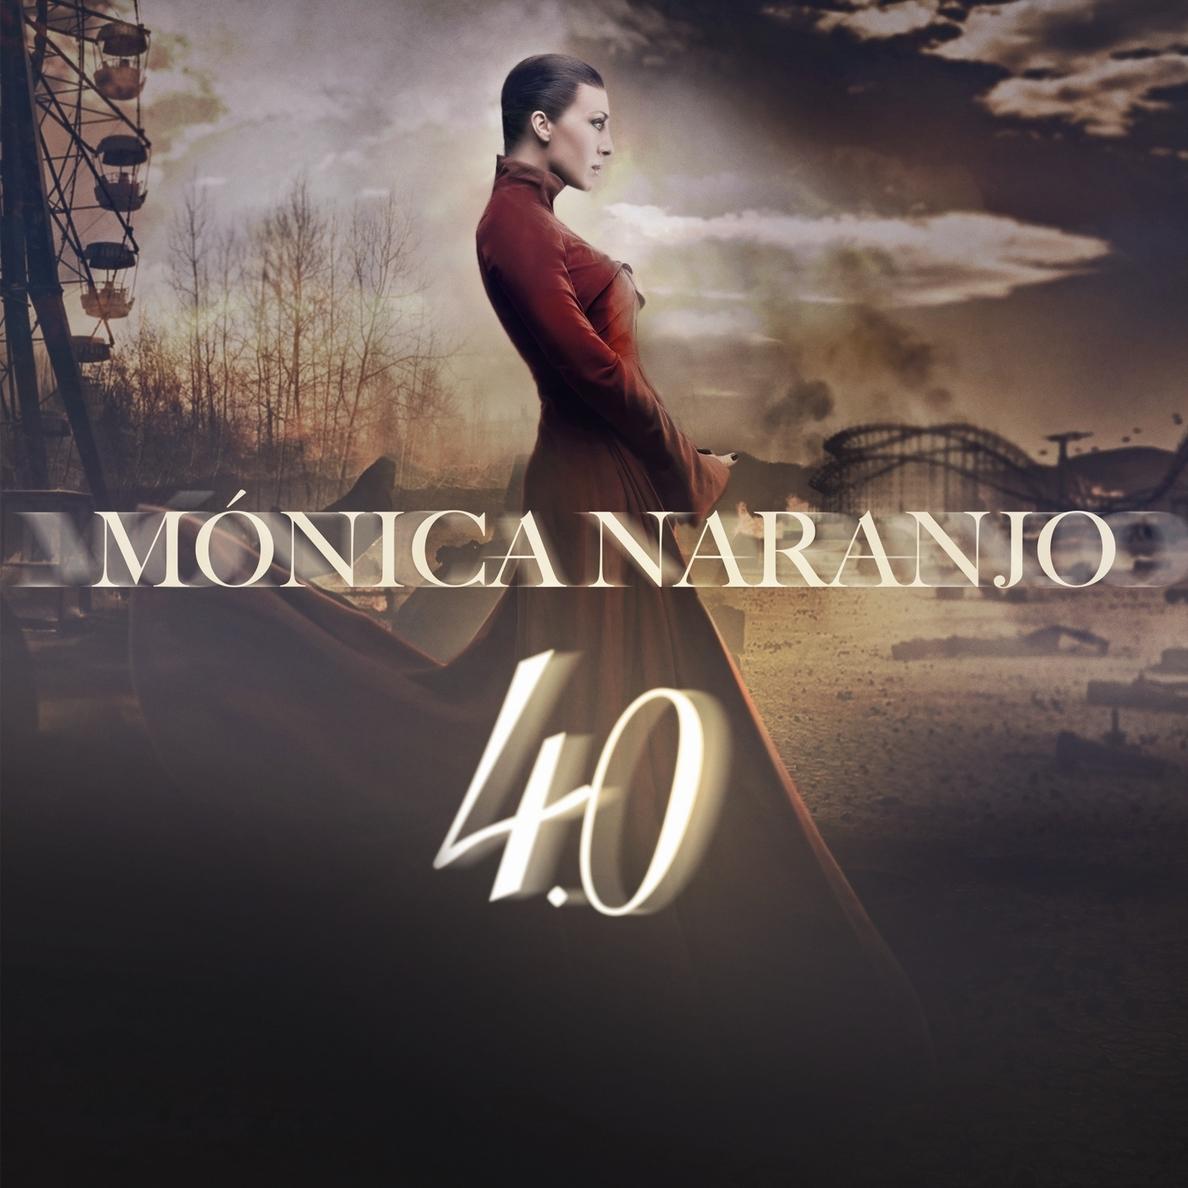 Mónica Naranjo sale de gira y pasará por Sevilla, Roquetas de Mar (Almería) y Málaga